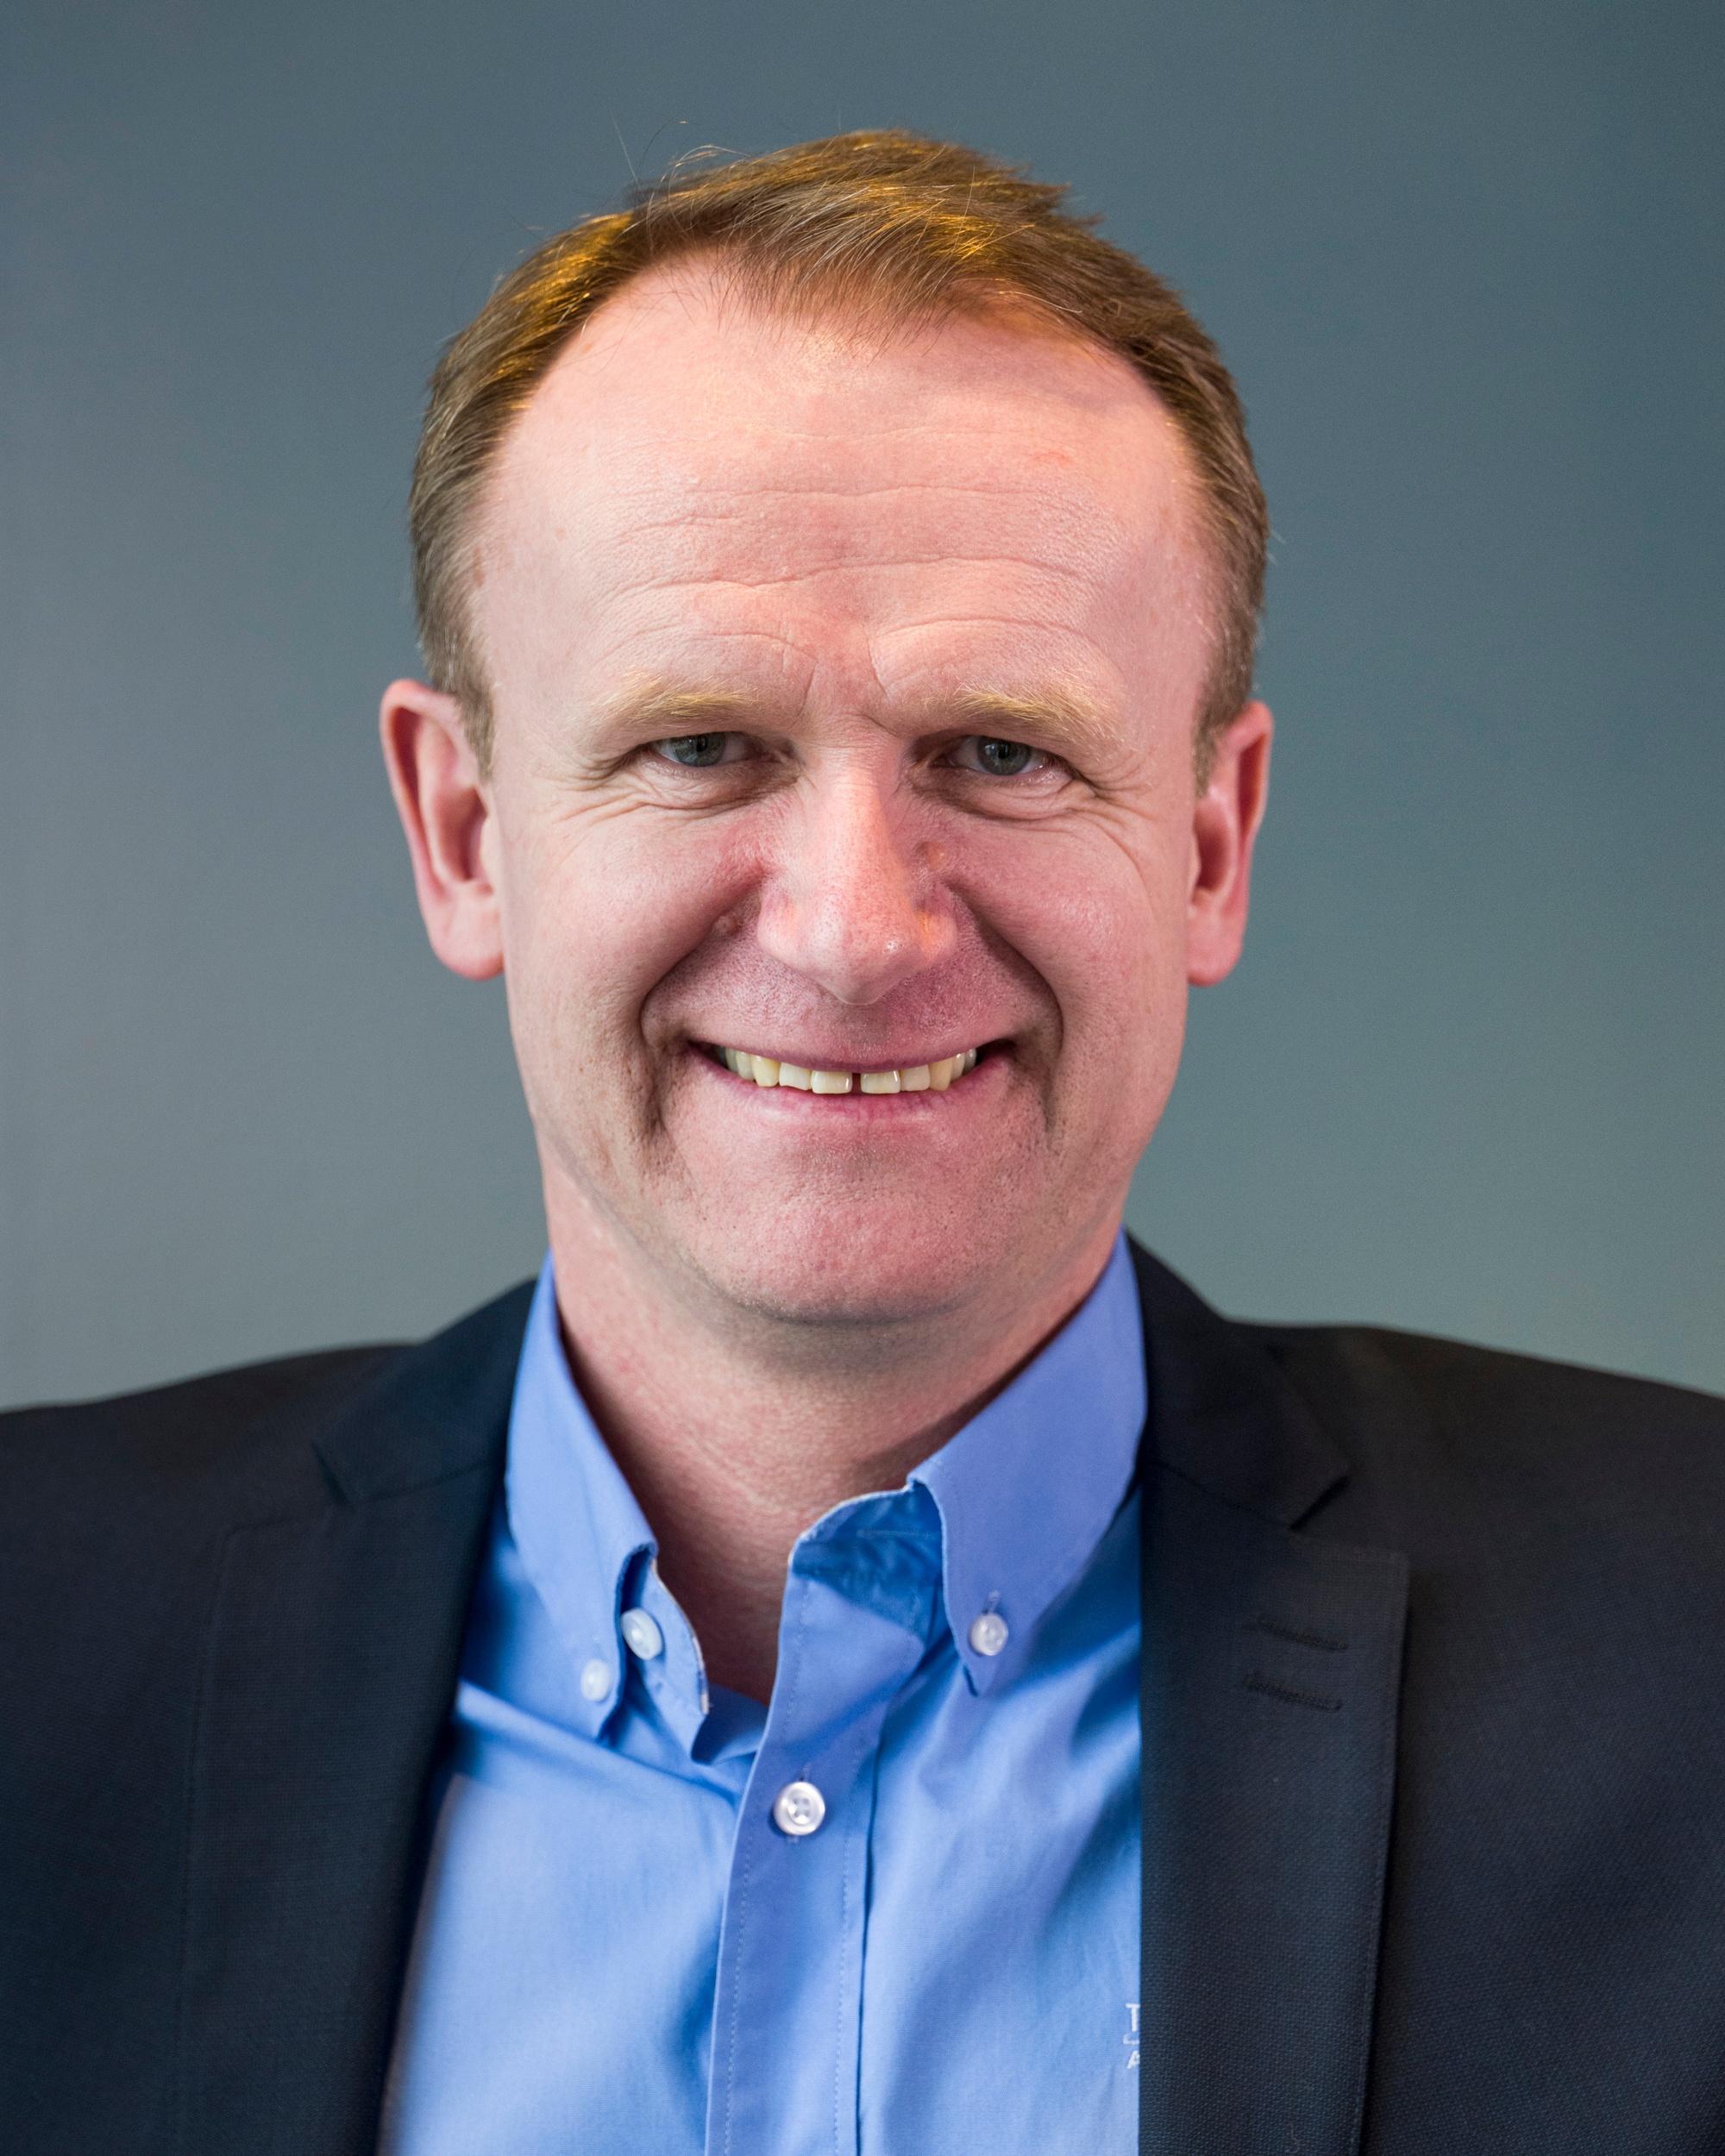 Rolf Arne Arnestad's photo